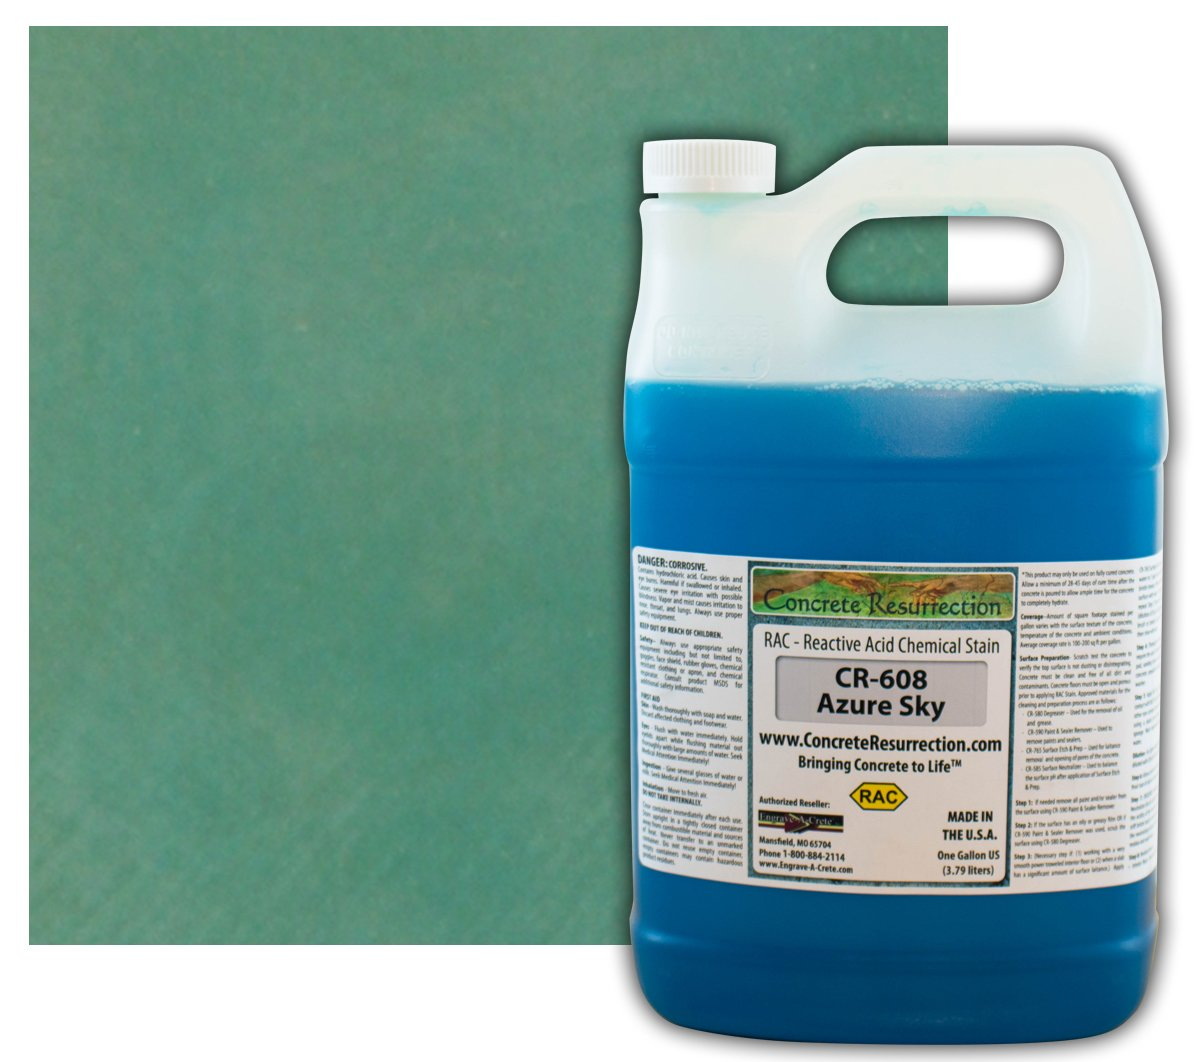 Concrete Stain Professional Easy to Use Acid Stain Azure Sky - 1 Gallon Concrete Resurrection